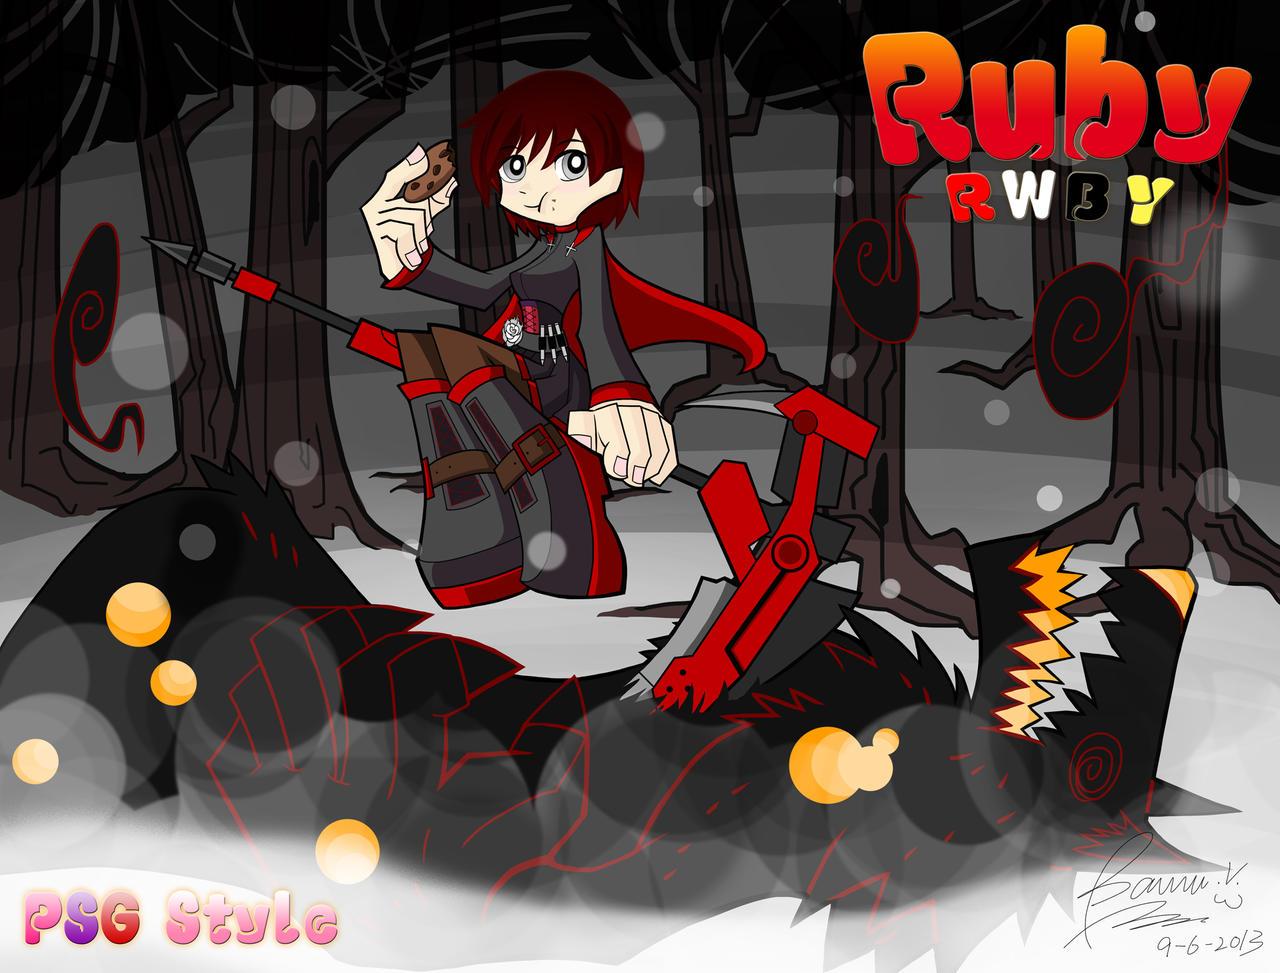 Rwby ruby by bannouneko on deviantart - Ruby rose rule 34 ...